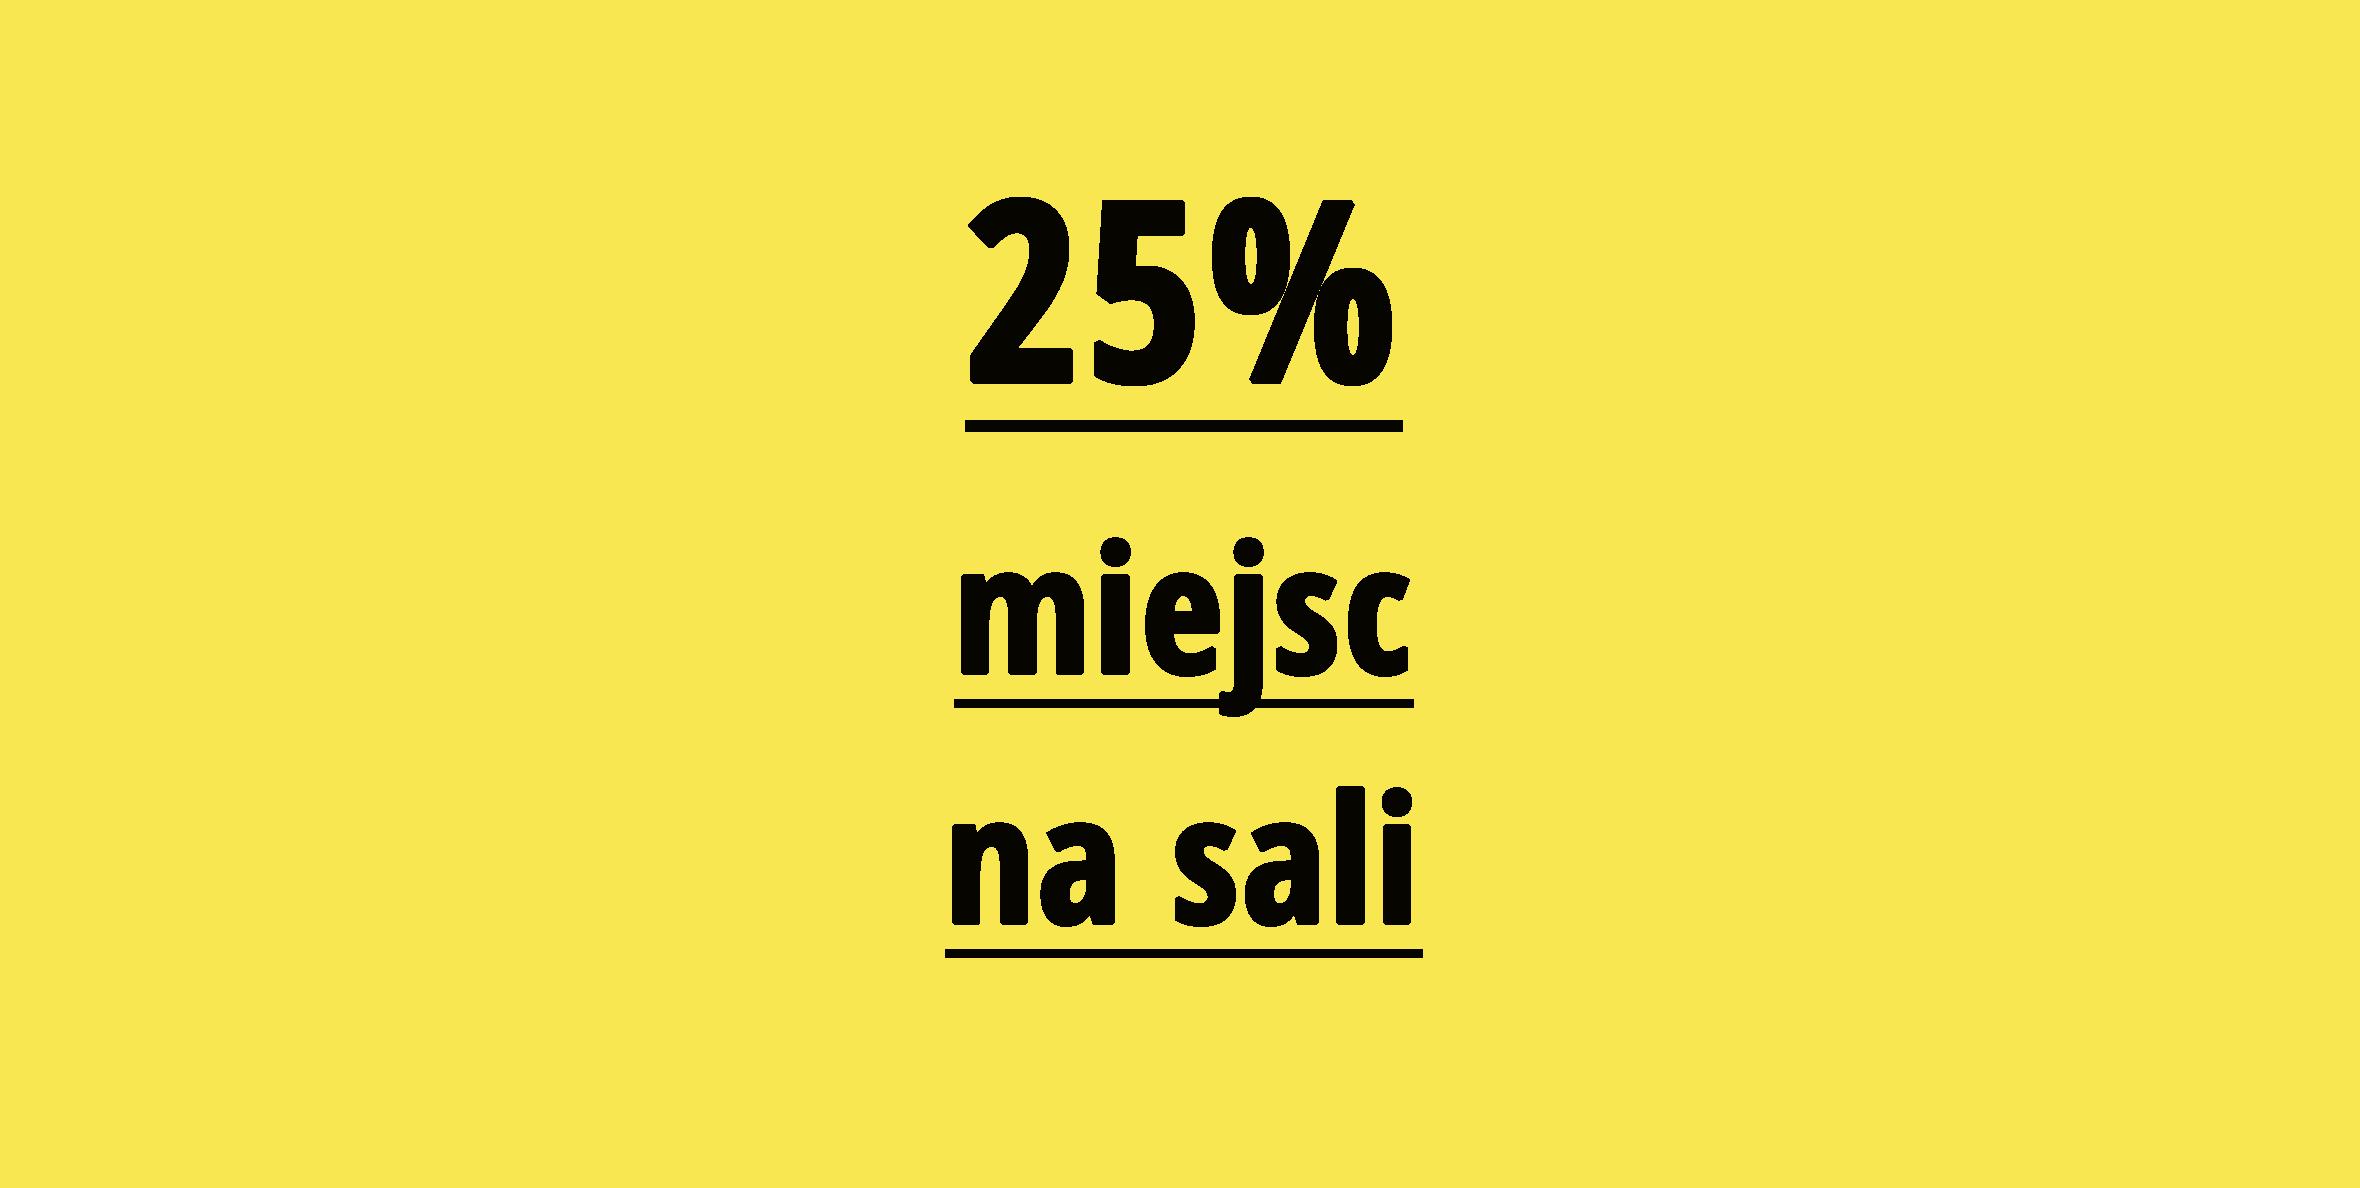 25 procent miejsc